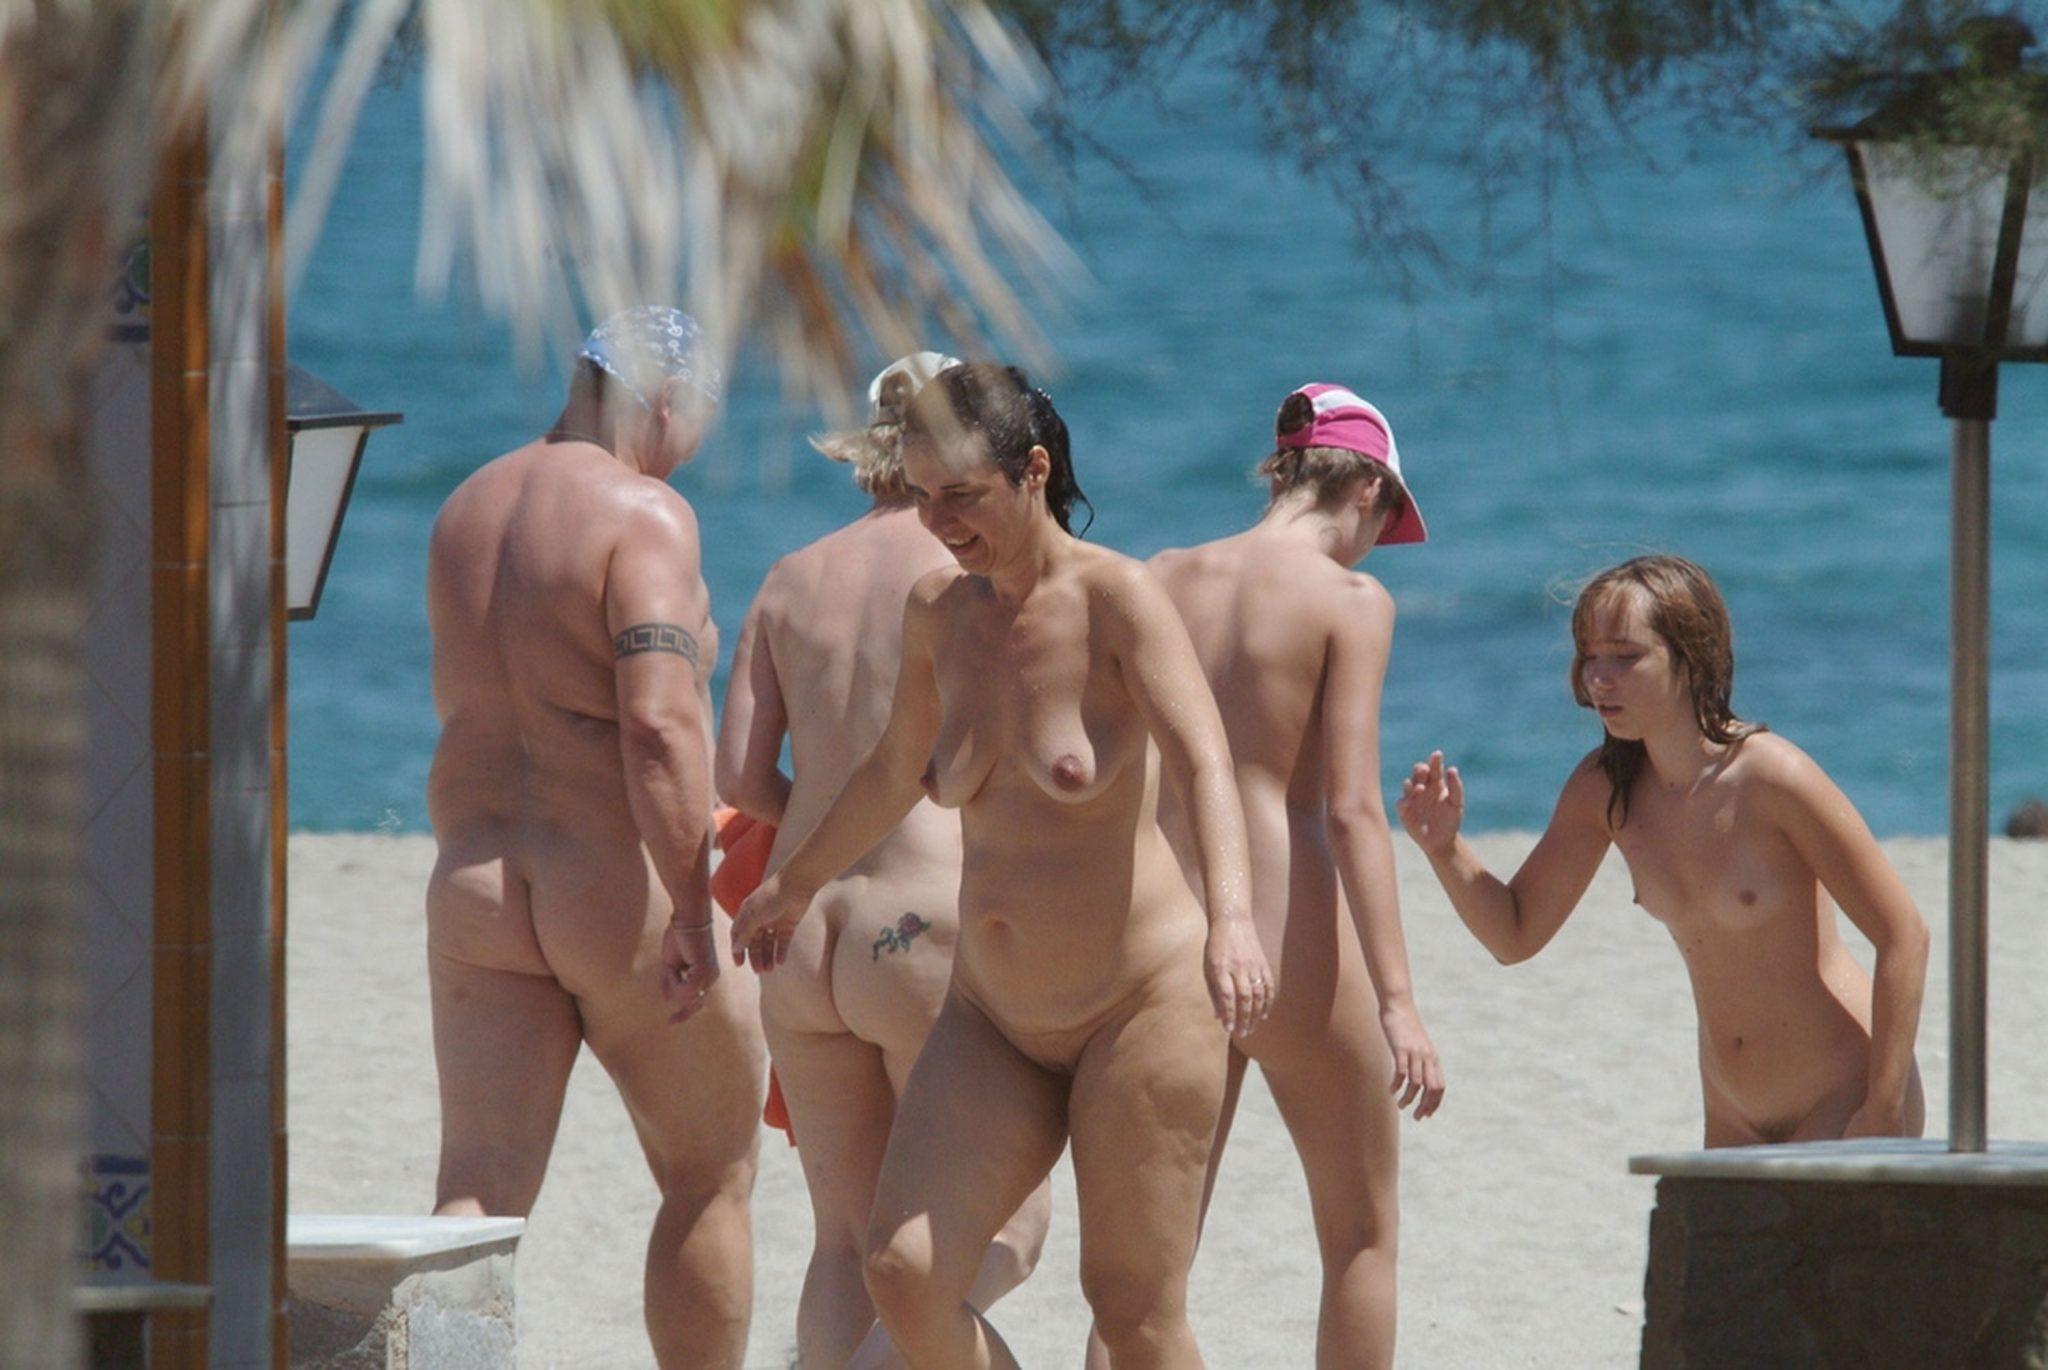 Gunnison Nude Gay Beach